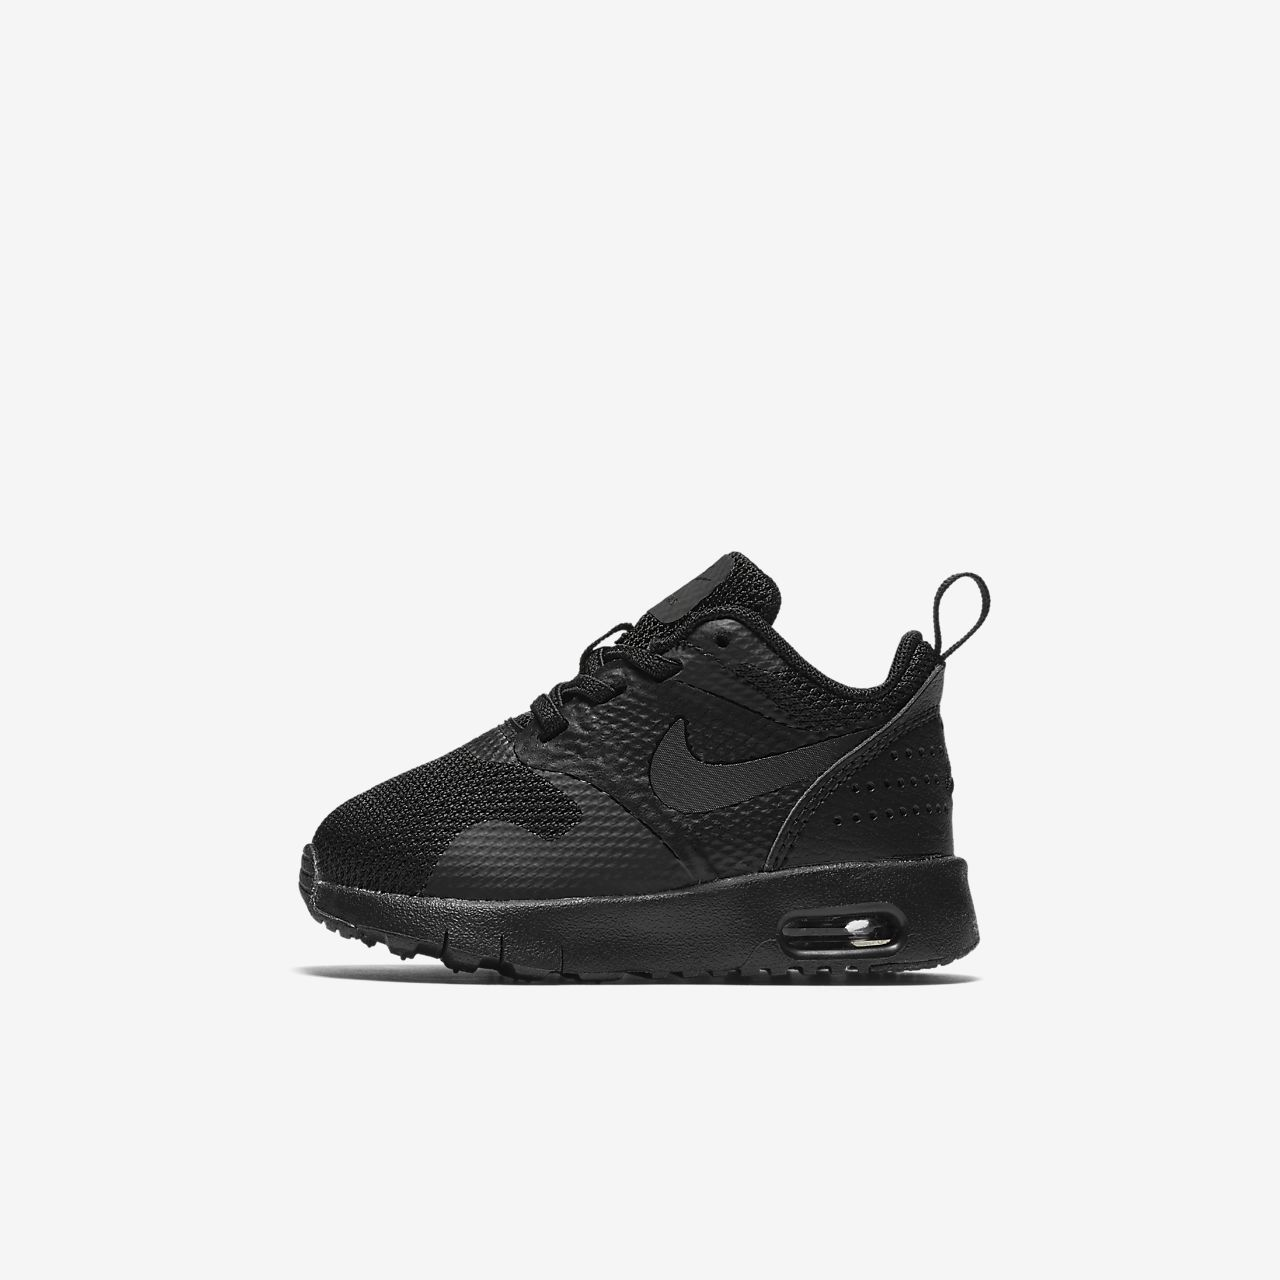 newest bb86e 9772e coupon code for nike air max tavas sko til babyer småbørn e2784 2f076